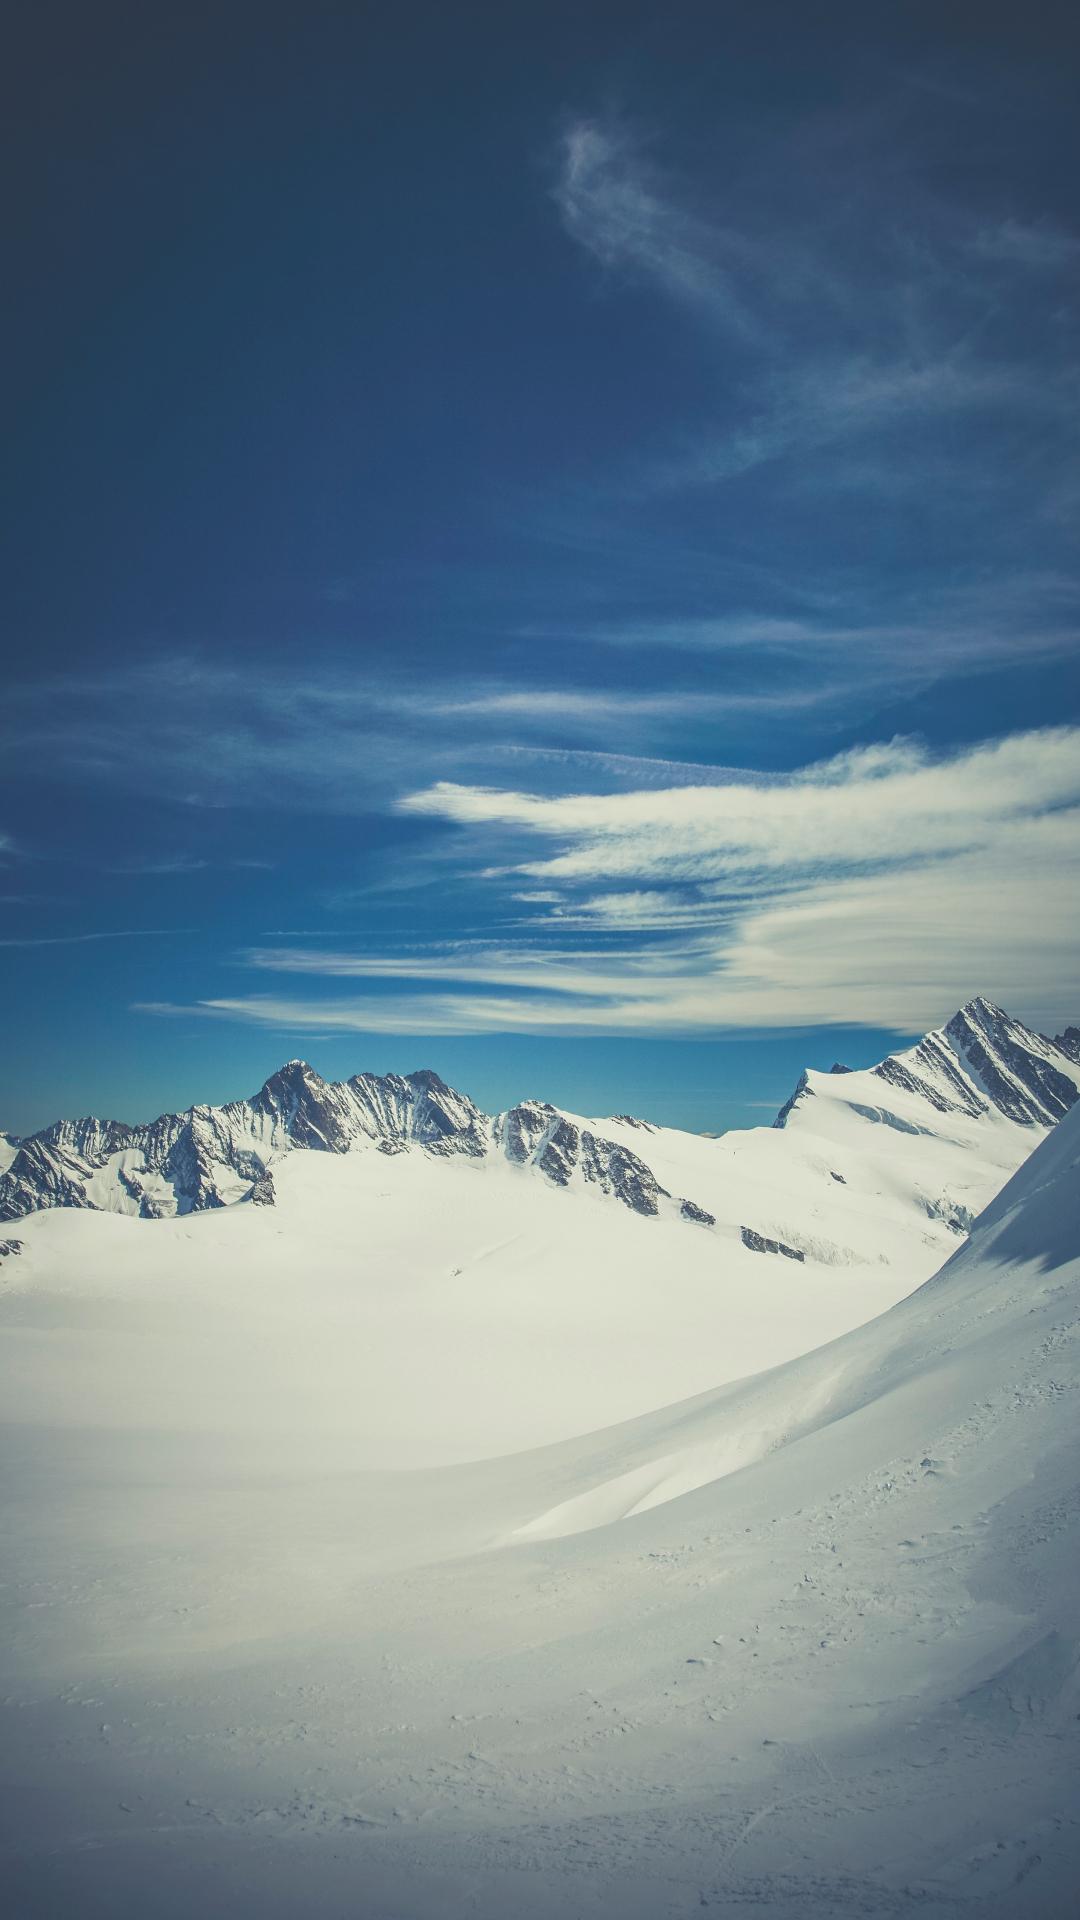 Snowy Swiss iPhone Wallpaper